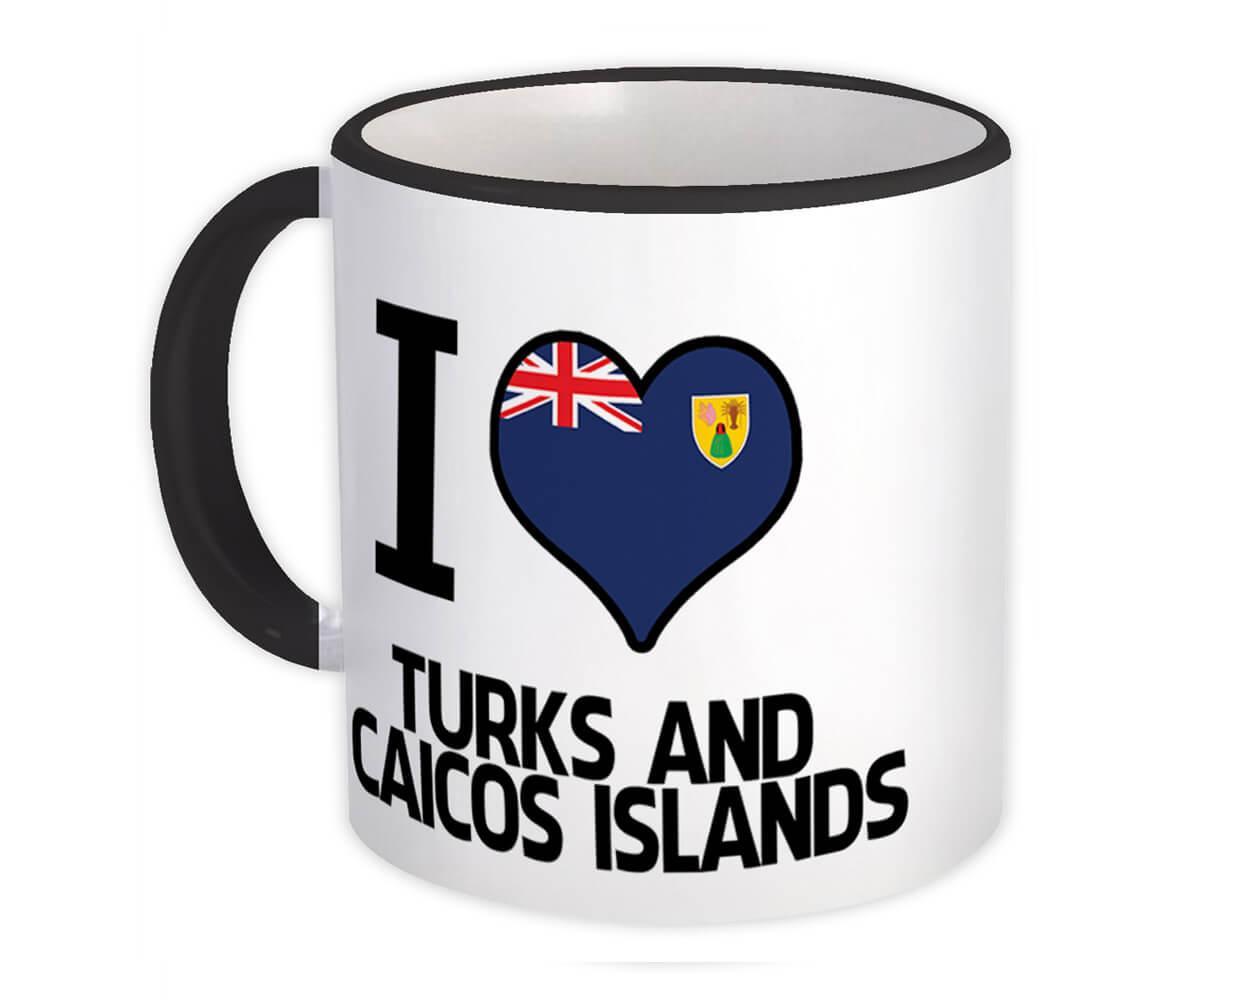 I Love Turks and Caicos Islands : Gift Mug Flag Heart Country Crest Islander